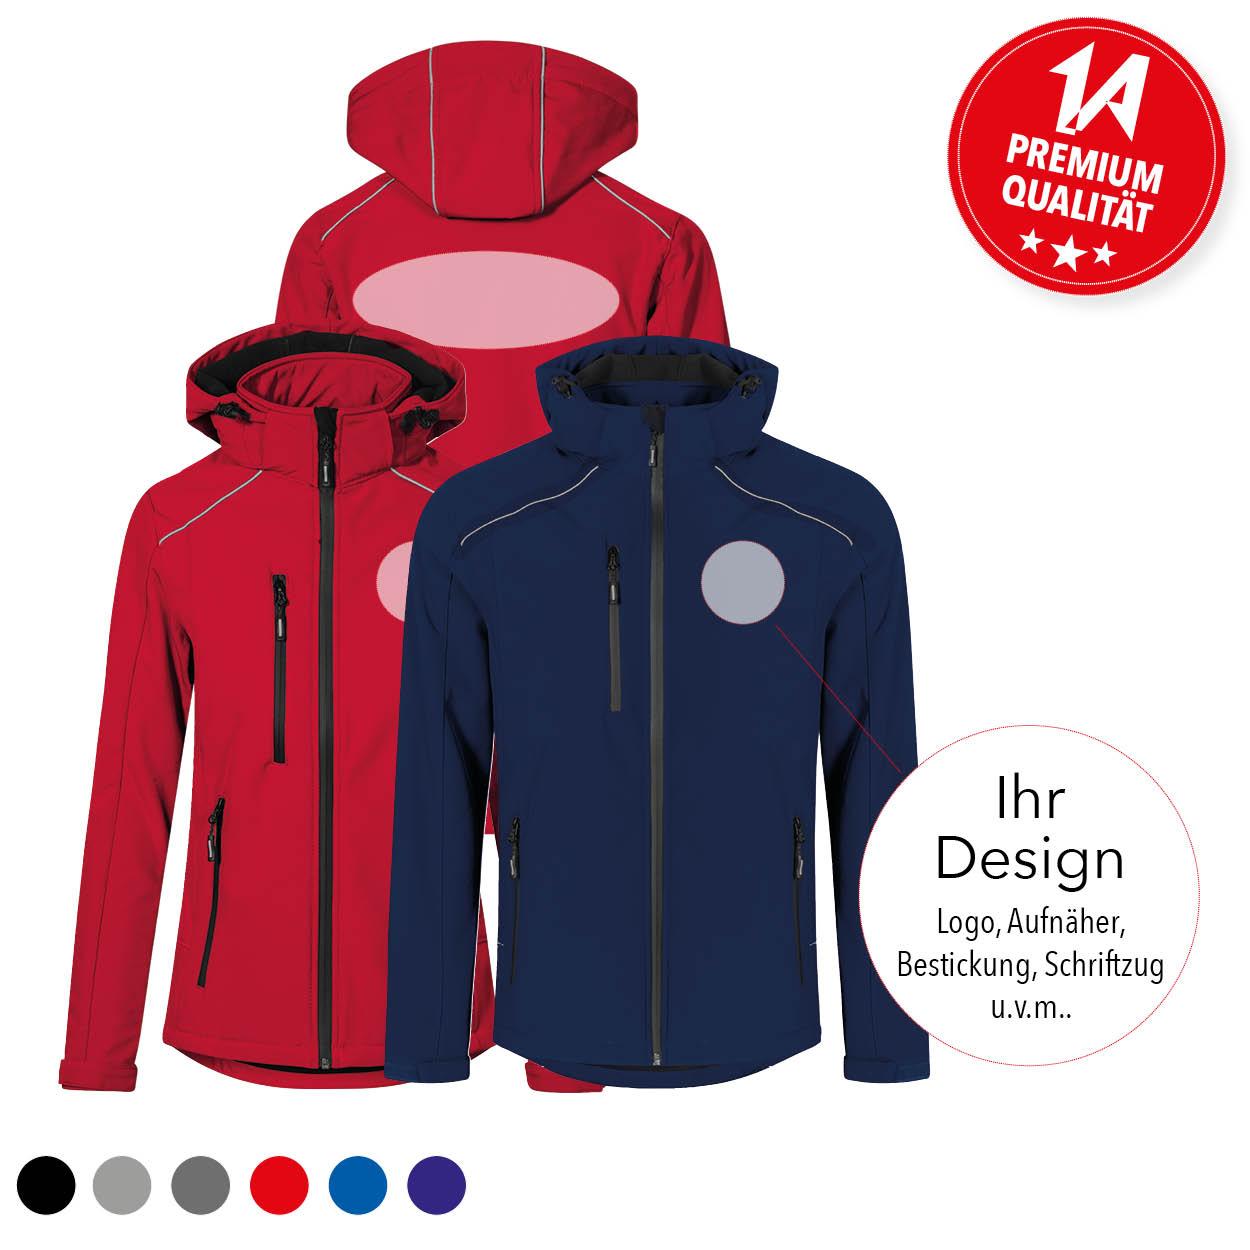 Softshell-Jacke - Individualisiert